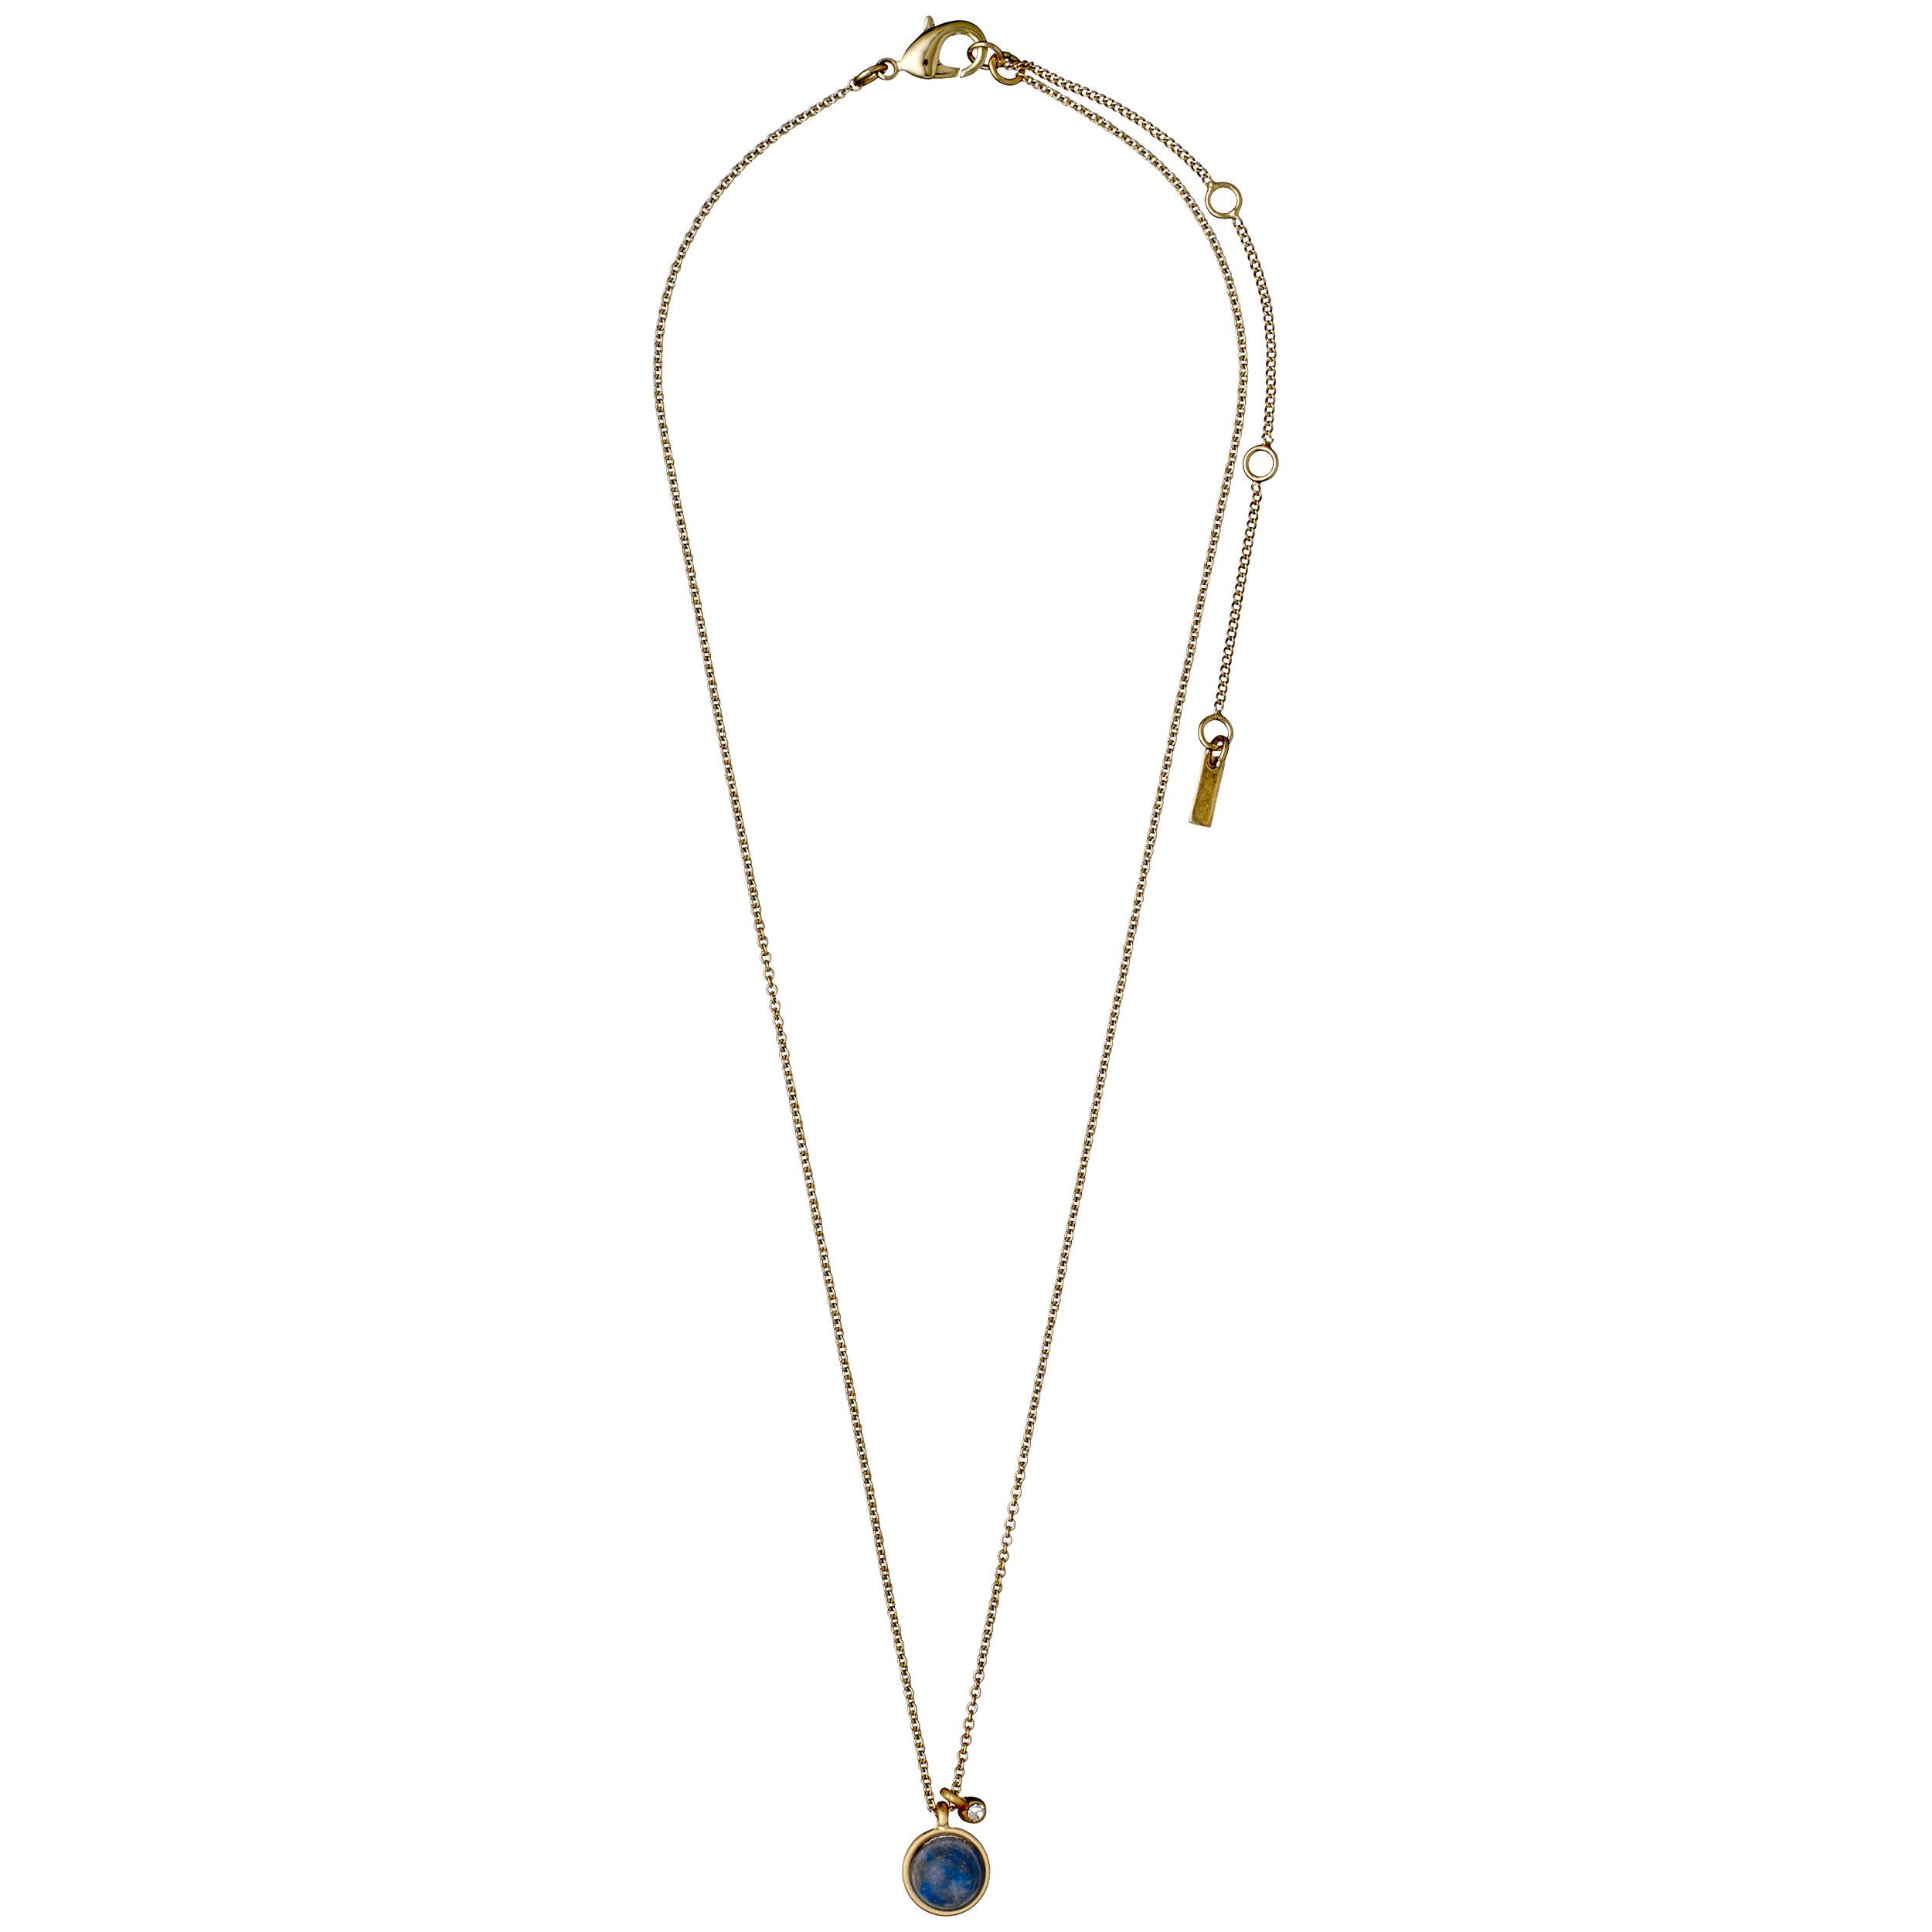 jewelry fullscreen curved ferrari bar yellow diamond t meira necklace view asymmetrical gold lyst